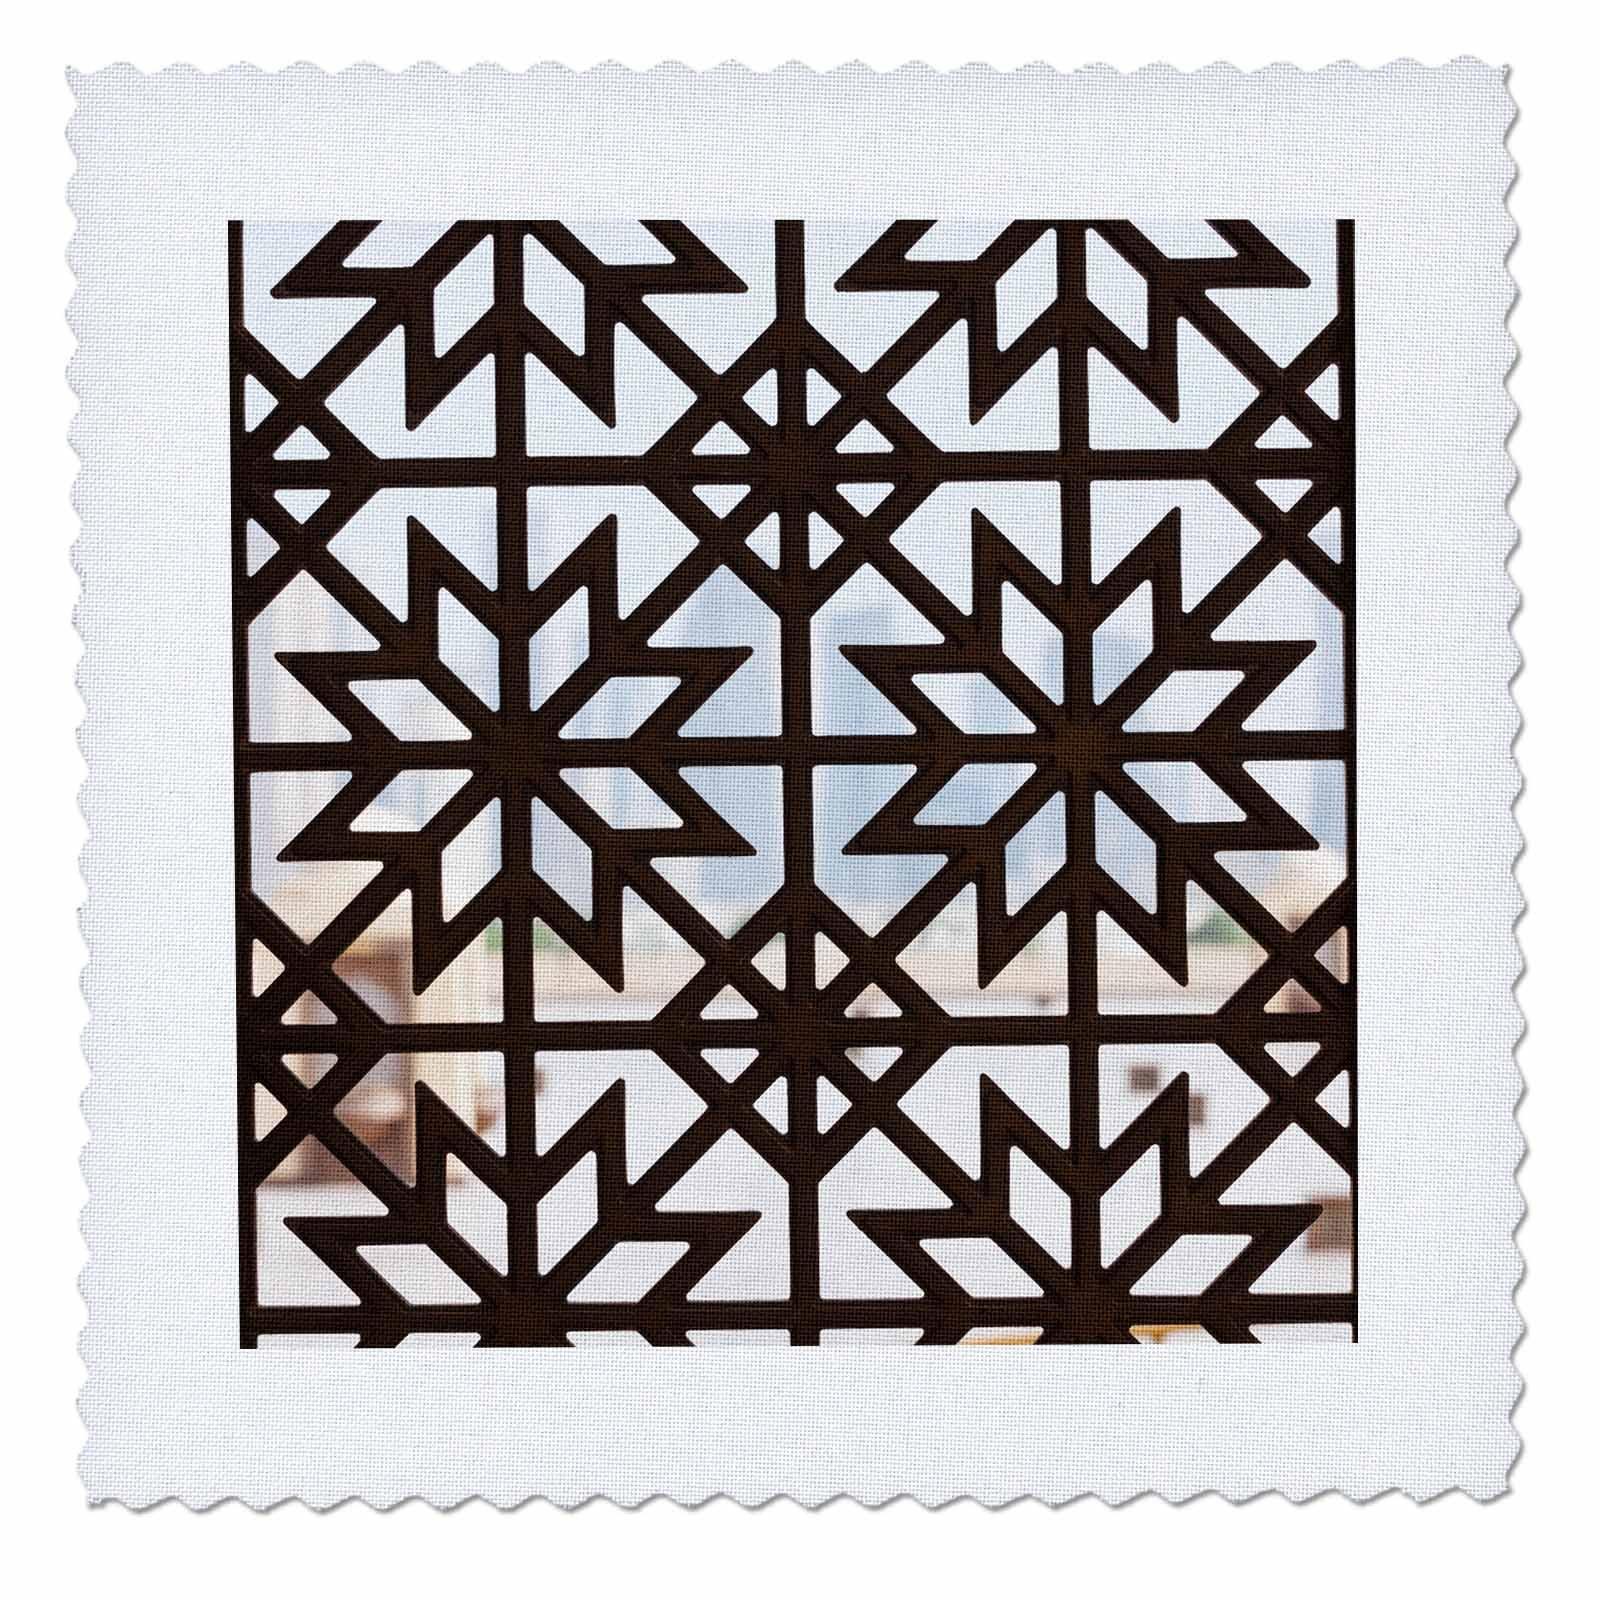 3dRose Danita Delimont - Patterns - Qatar, Doha, Abdul Wahhab Mosque, window detail - 22x22 inch quilt square (qs_257254_9)